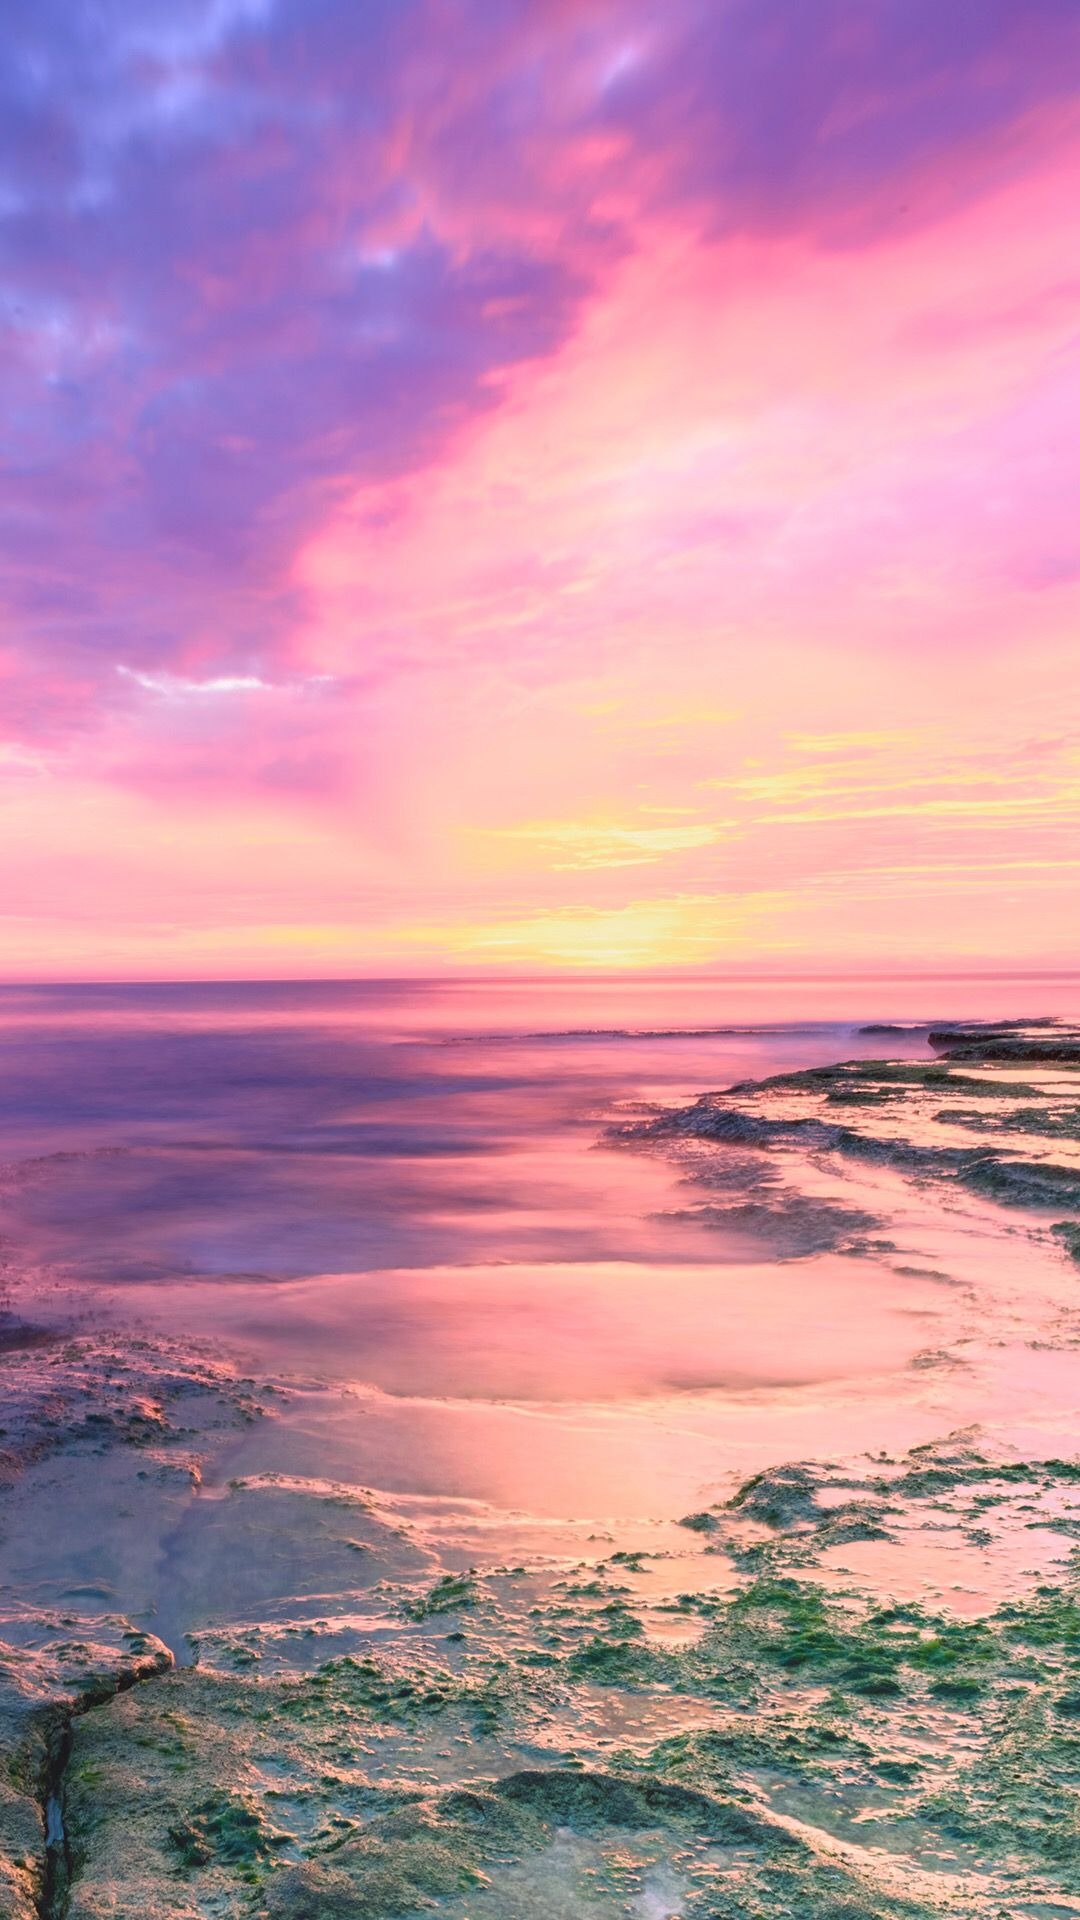 Wallpapers Pretty Beach Nature Sea Ocean World Music Sunset Sunrise Pink Instagram Beach Sunset Wallpaper Sunset Iphone Wallpaper Sunset Wallpaper